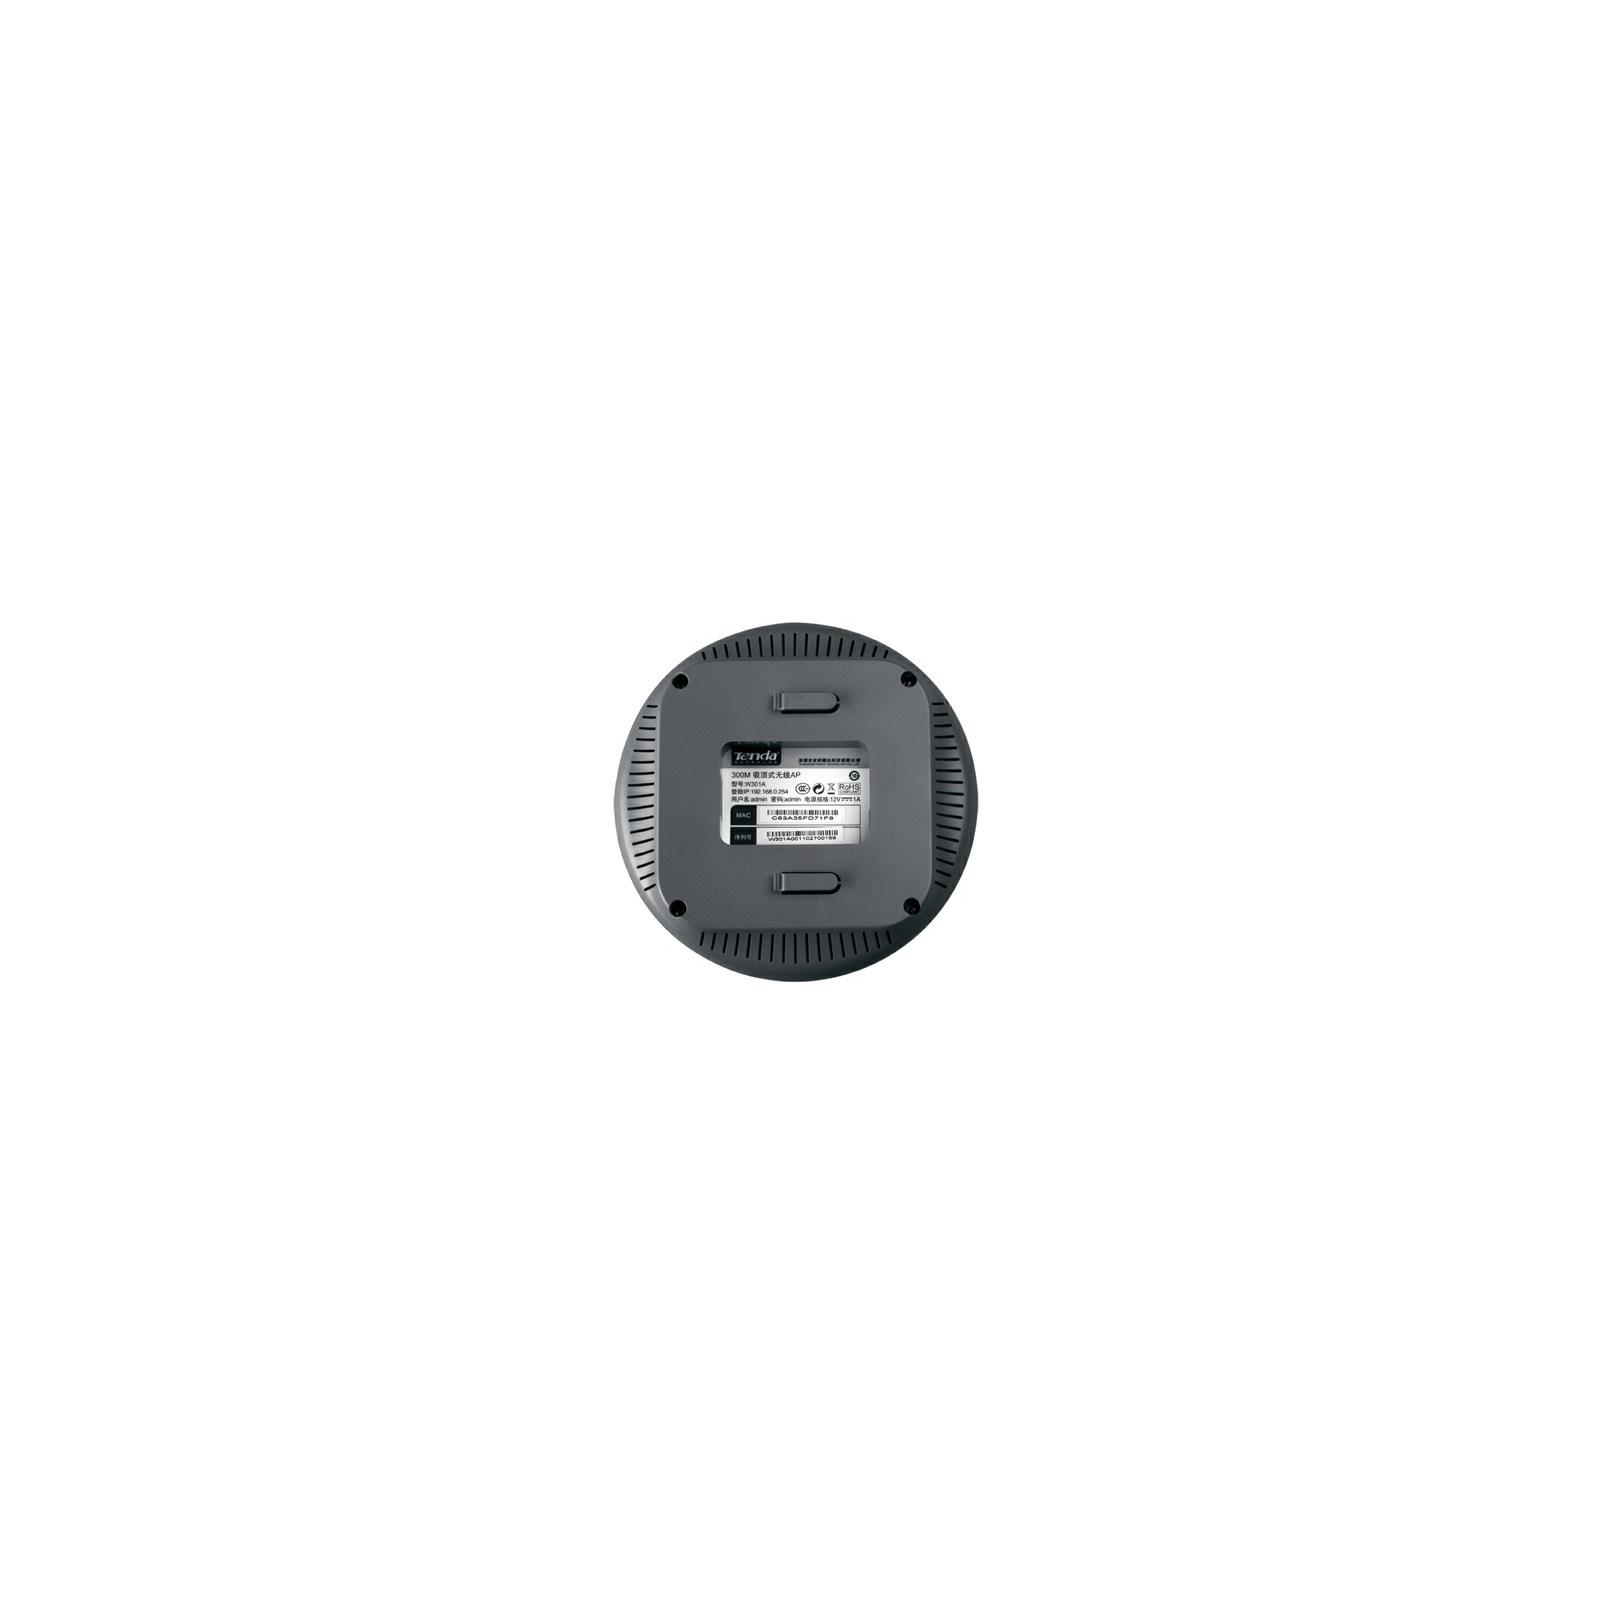 Точка доступа Wi-Fi TENDA W301A изображение 2